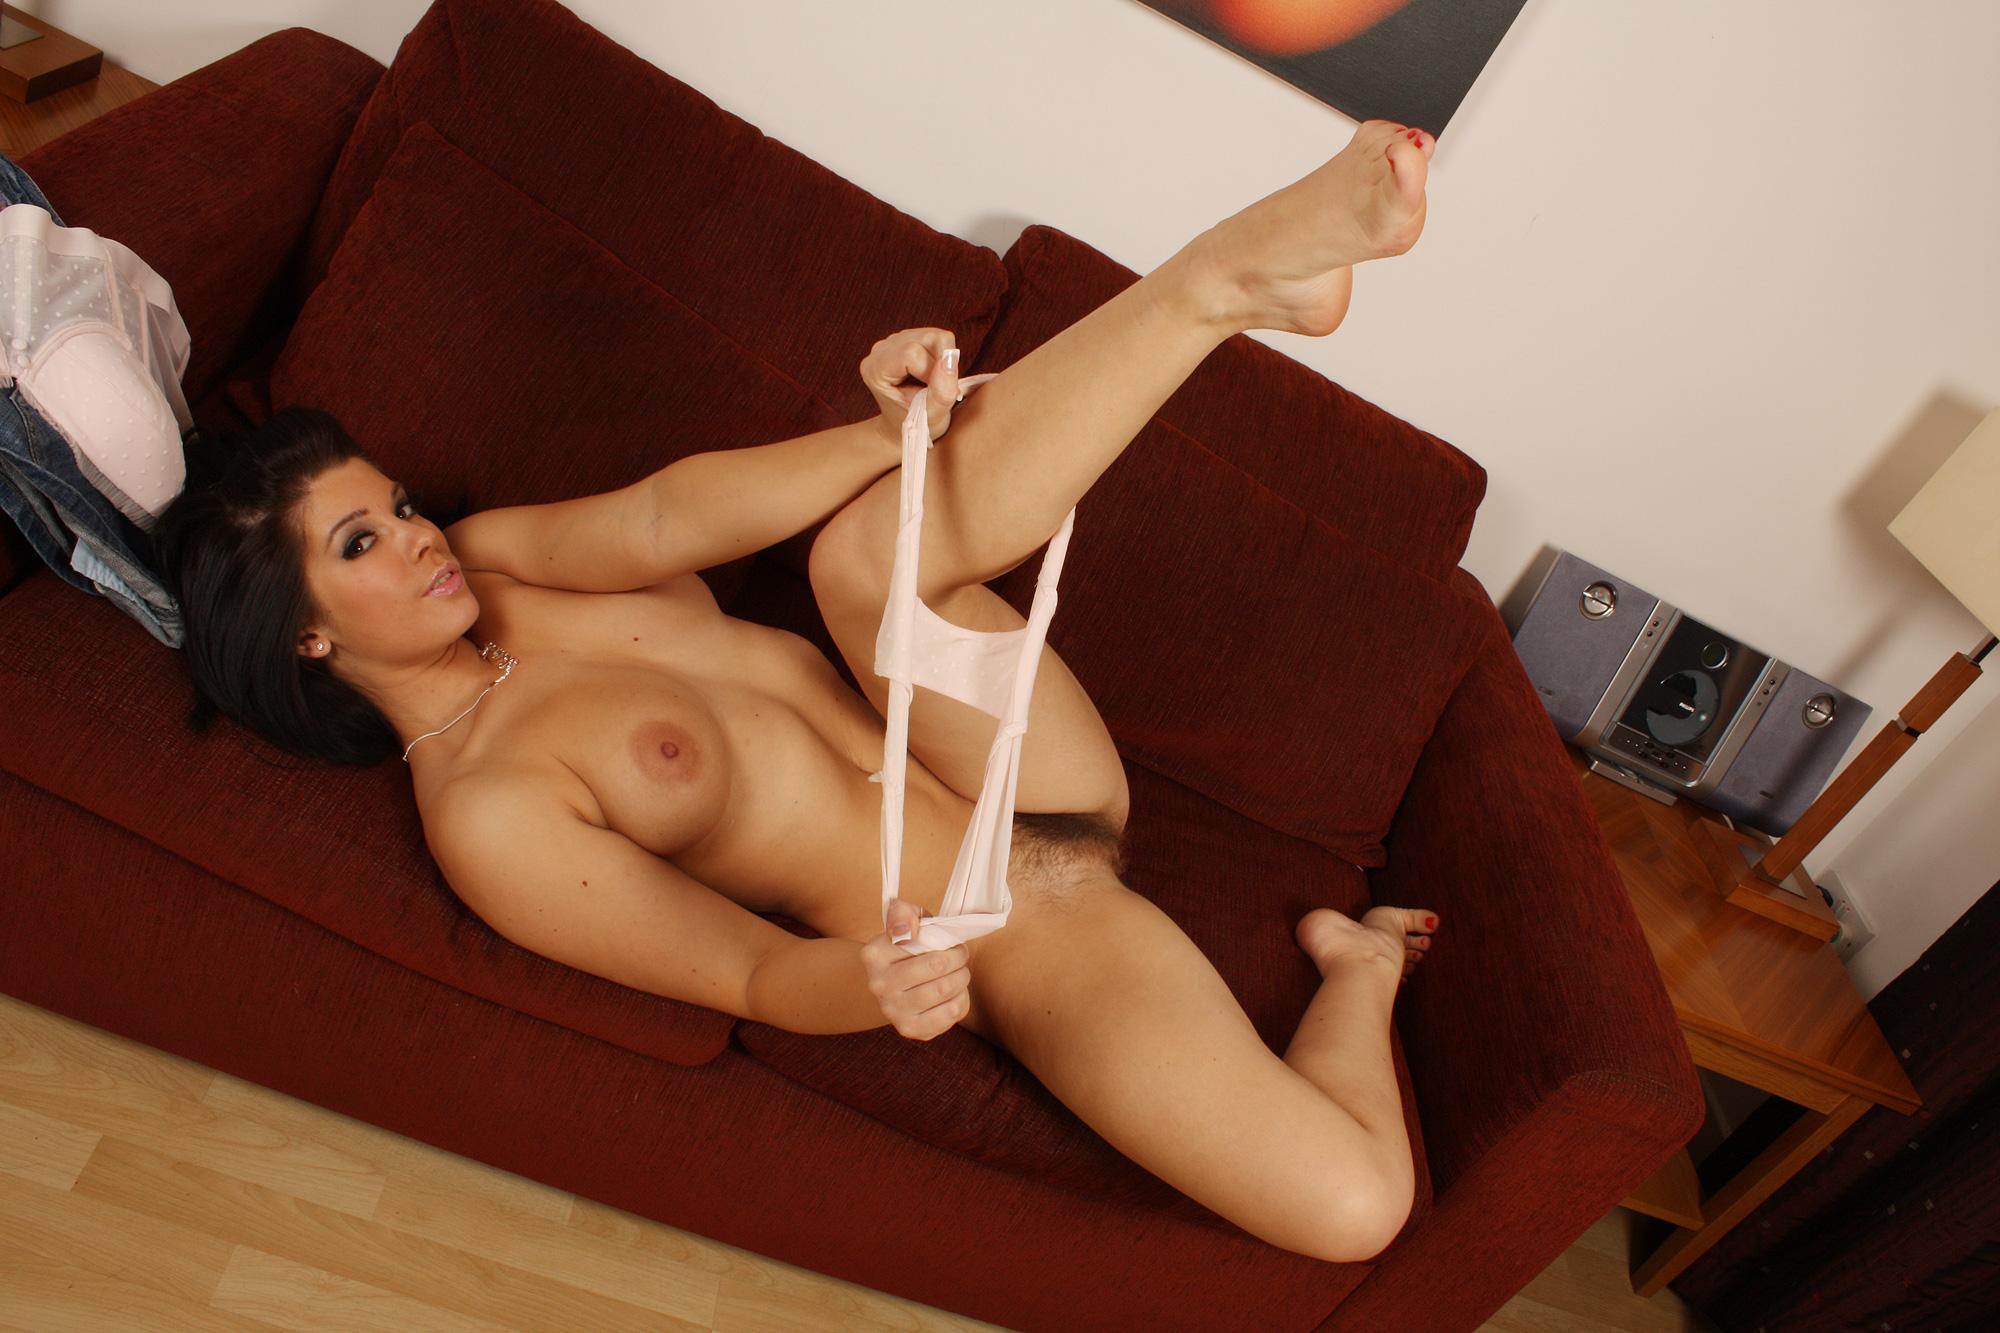 Cybersex heiße Fotos nackt #6